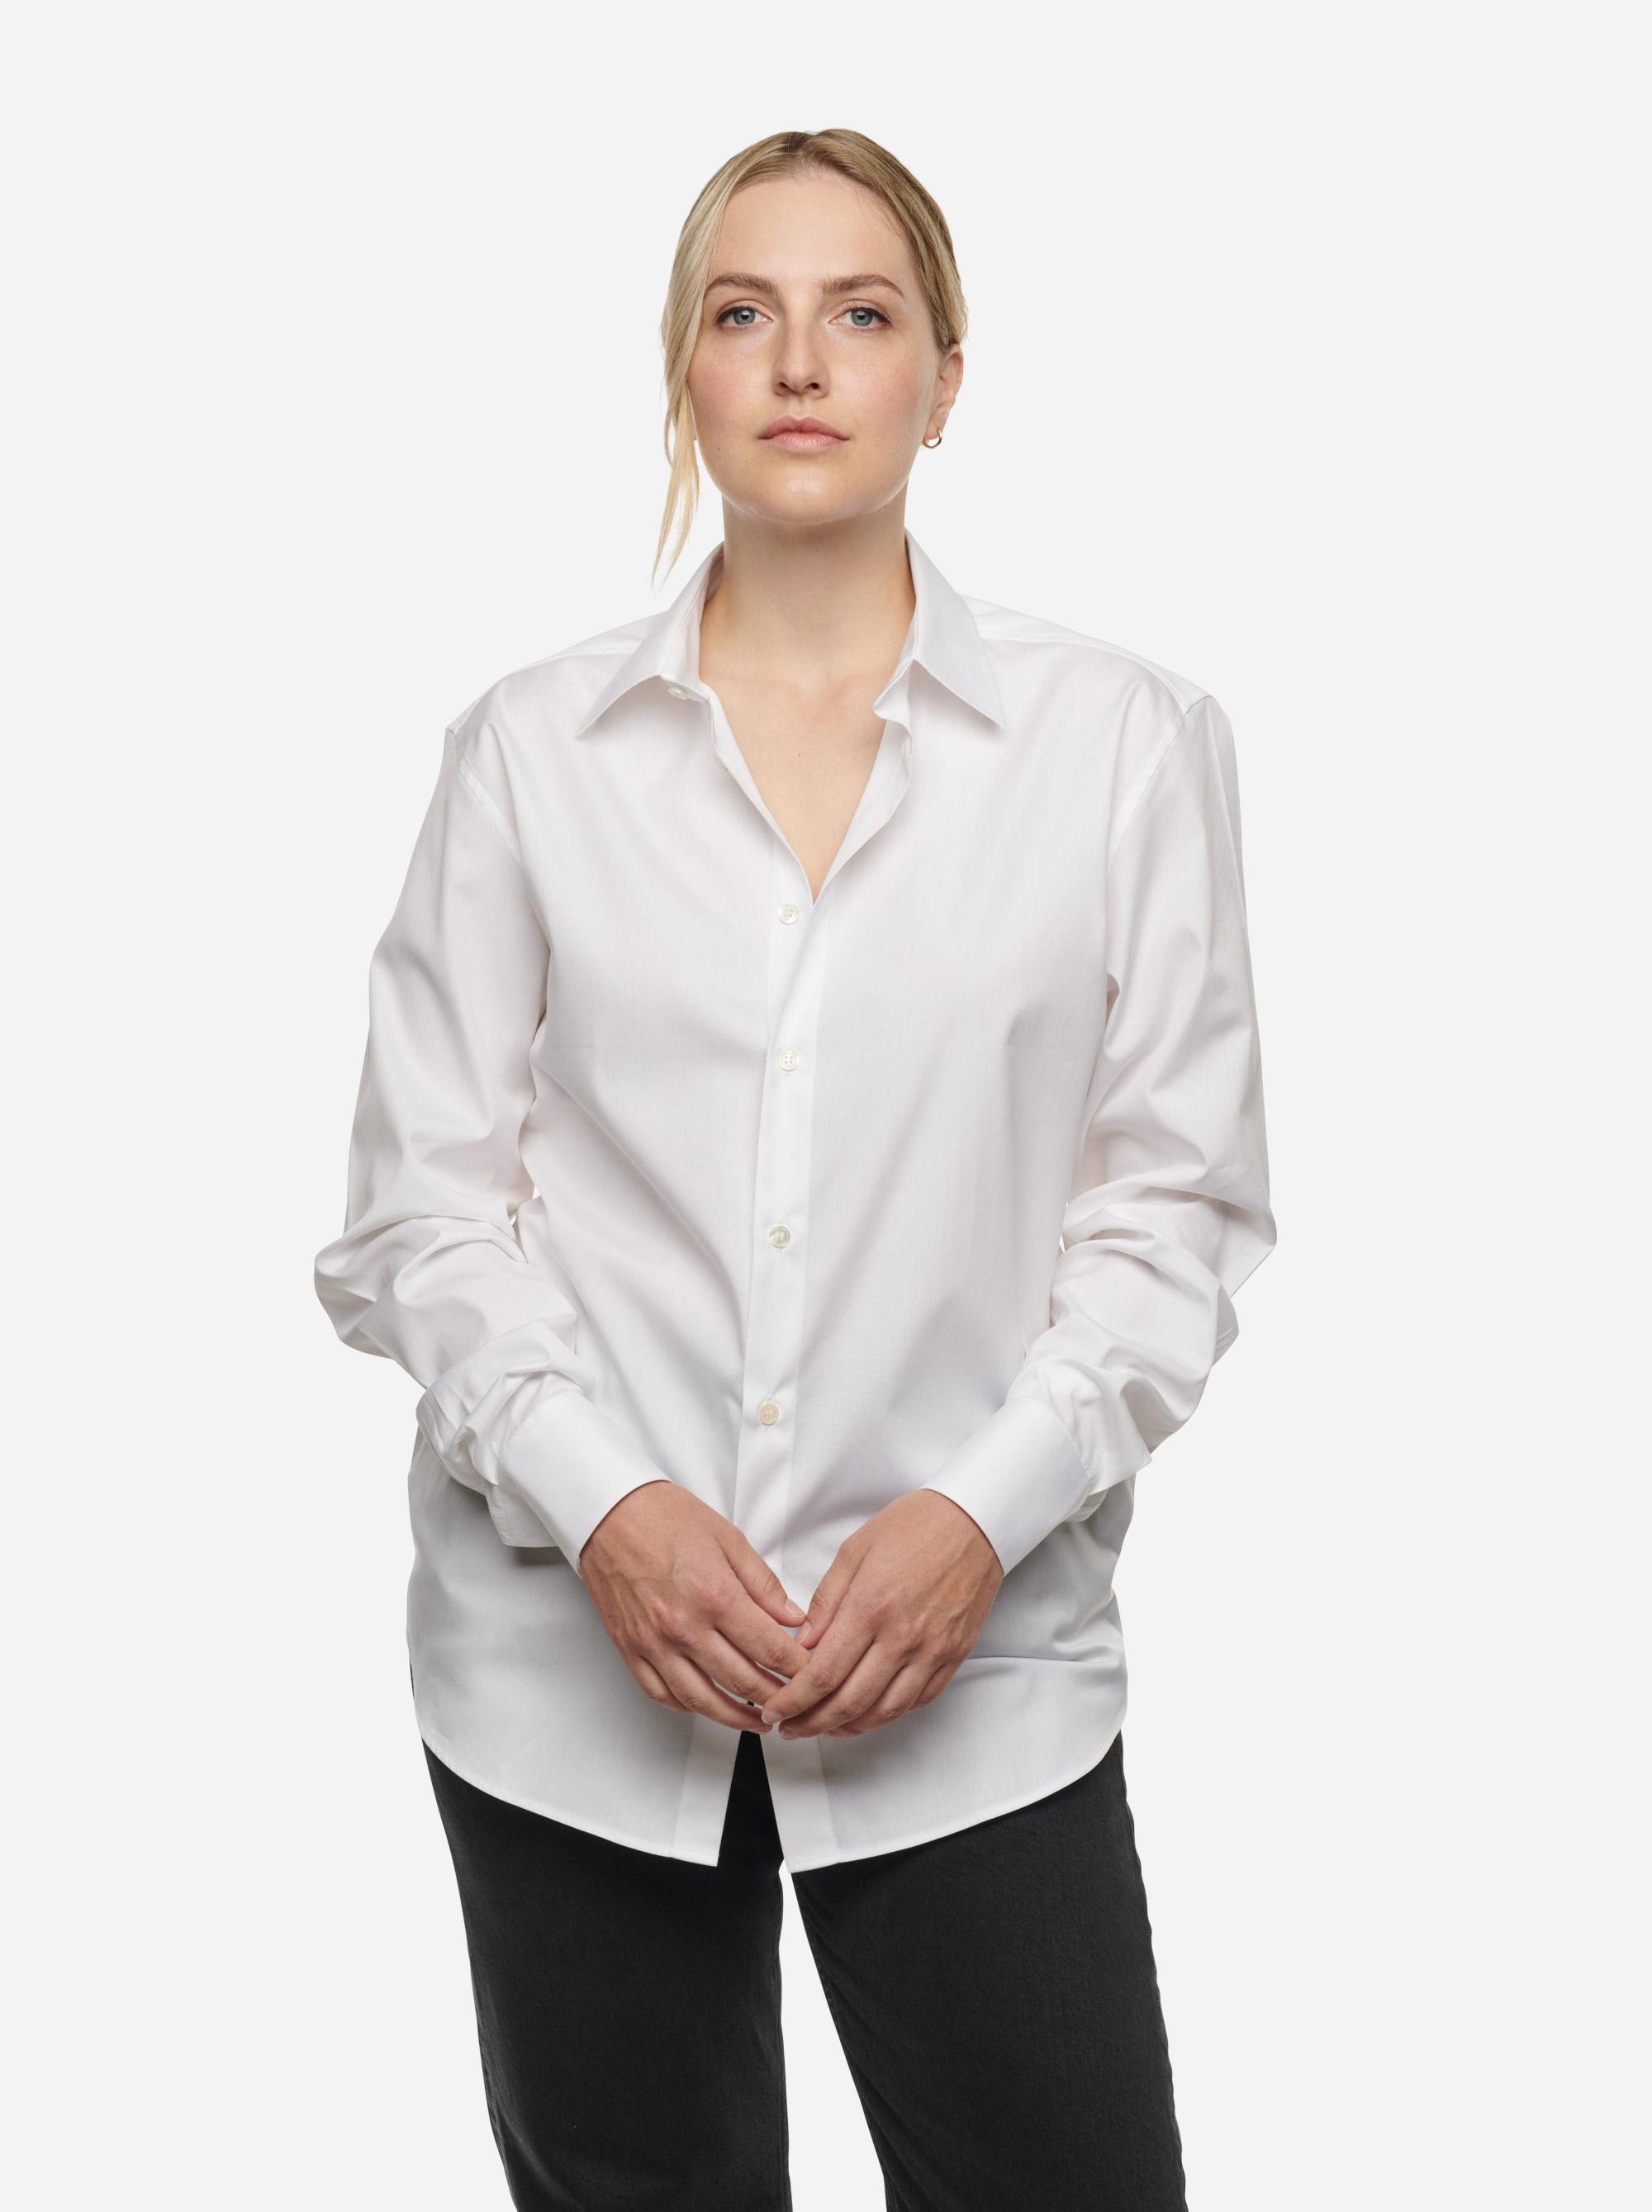 Teym-Shirt-White-women-mens-4